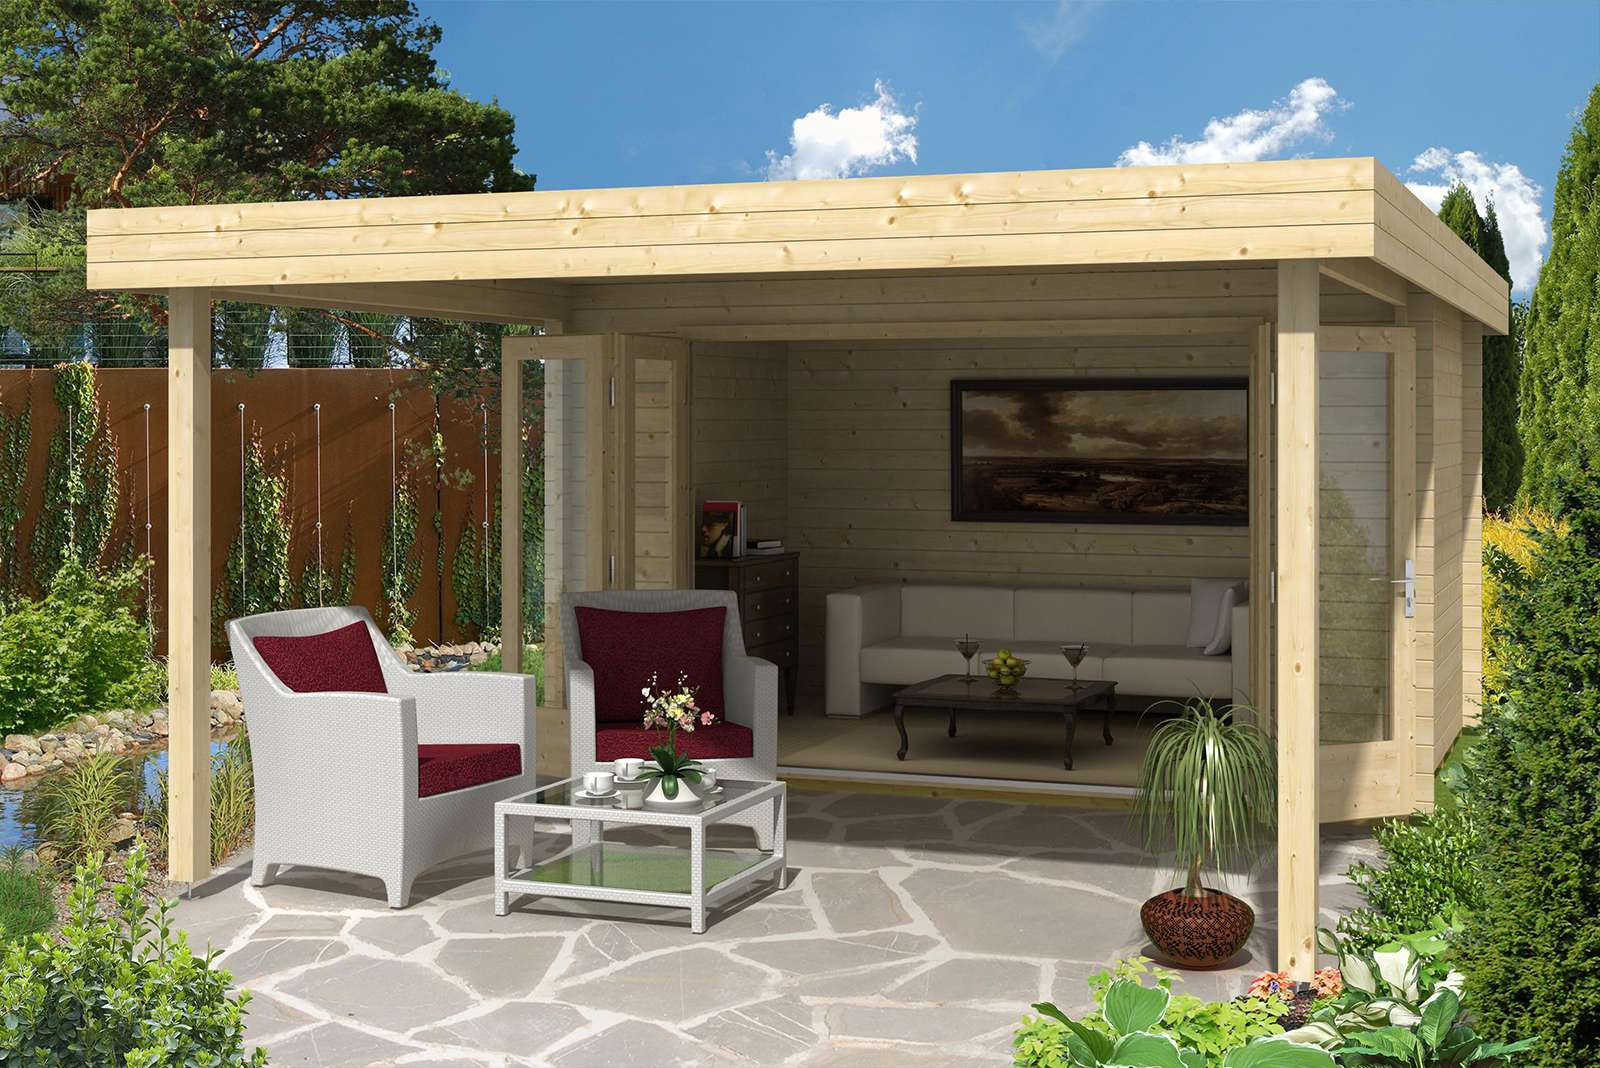 Trendig Gartenhaus 3x4m (12qm): Top Auswahl, faire Preise HH77